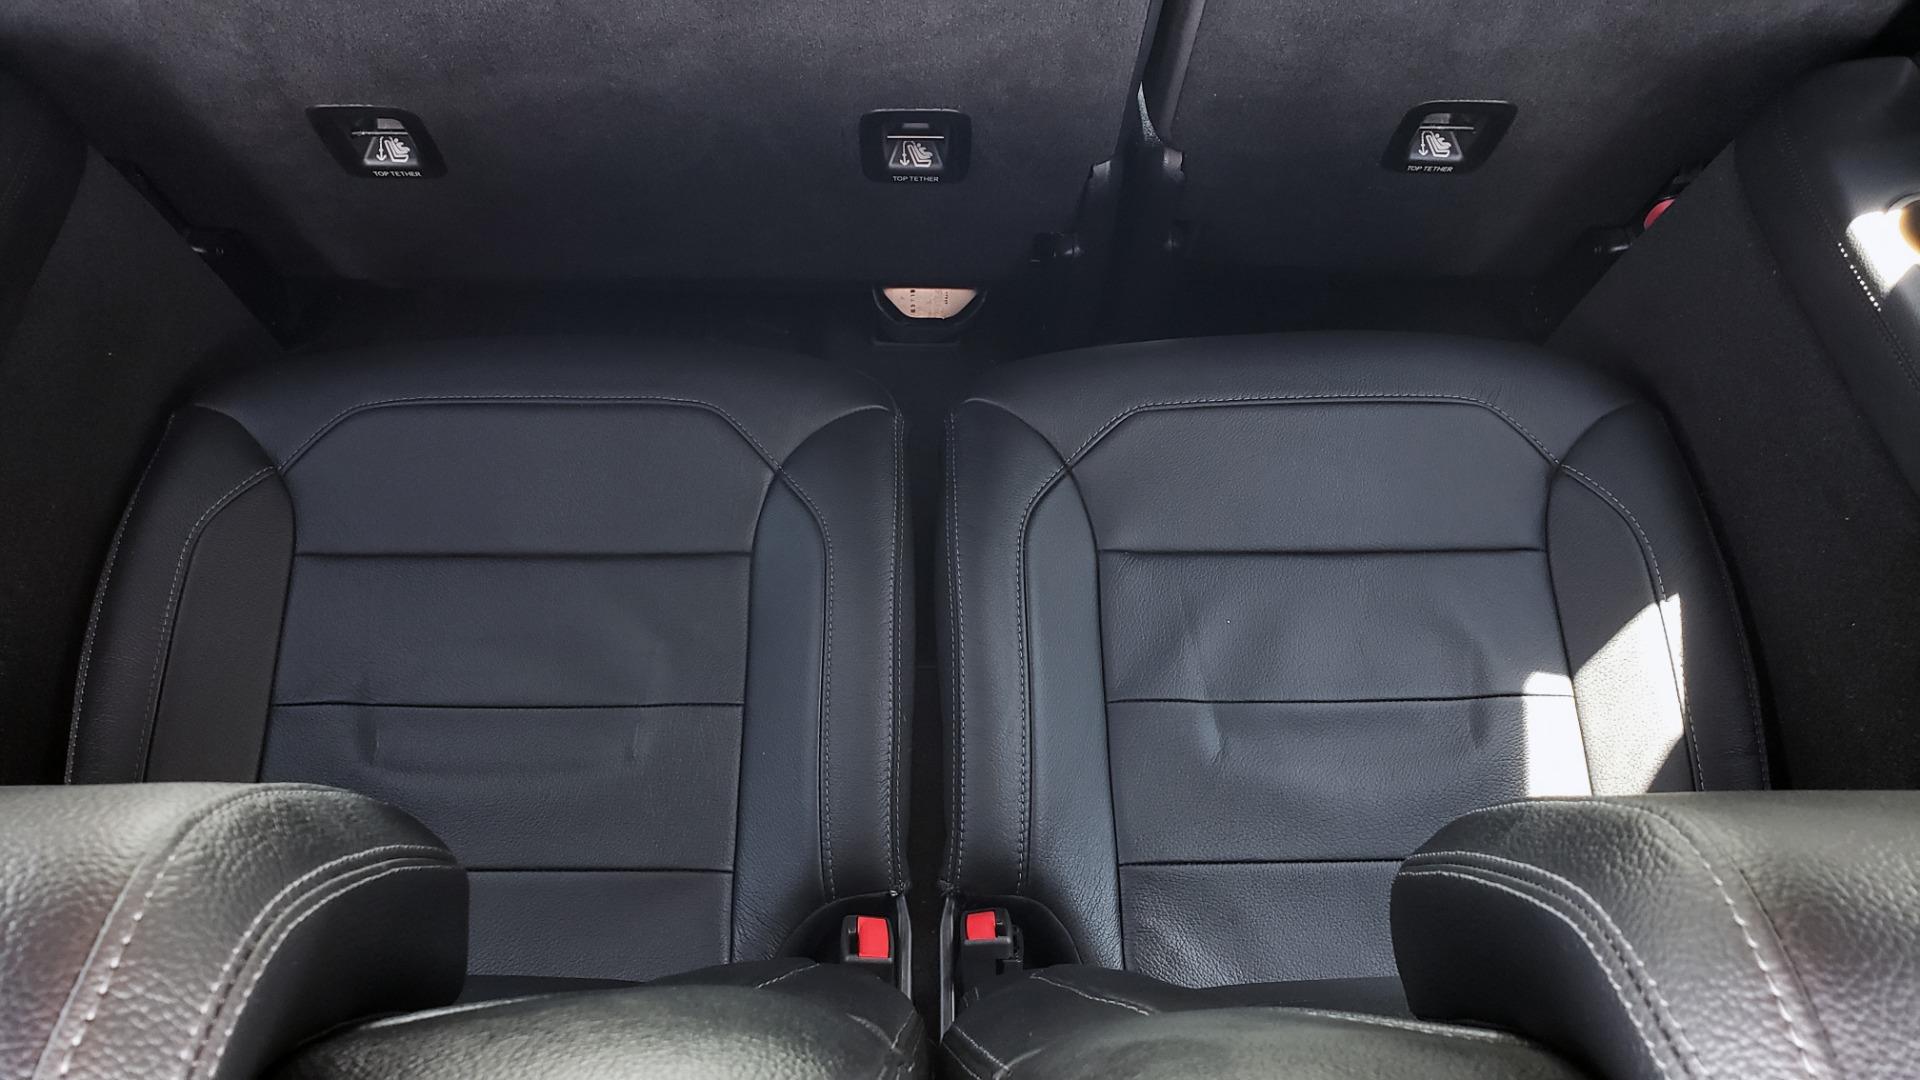 Used 2017 Mercedes-Benz GLS GLS 550 for sale Sold at Formula Imports in Charlotte NC 28227 23